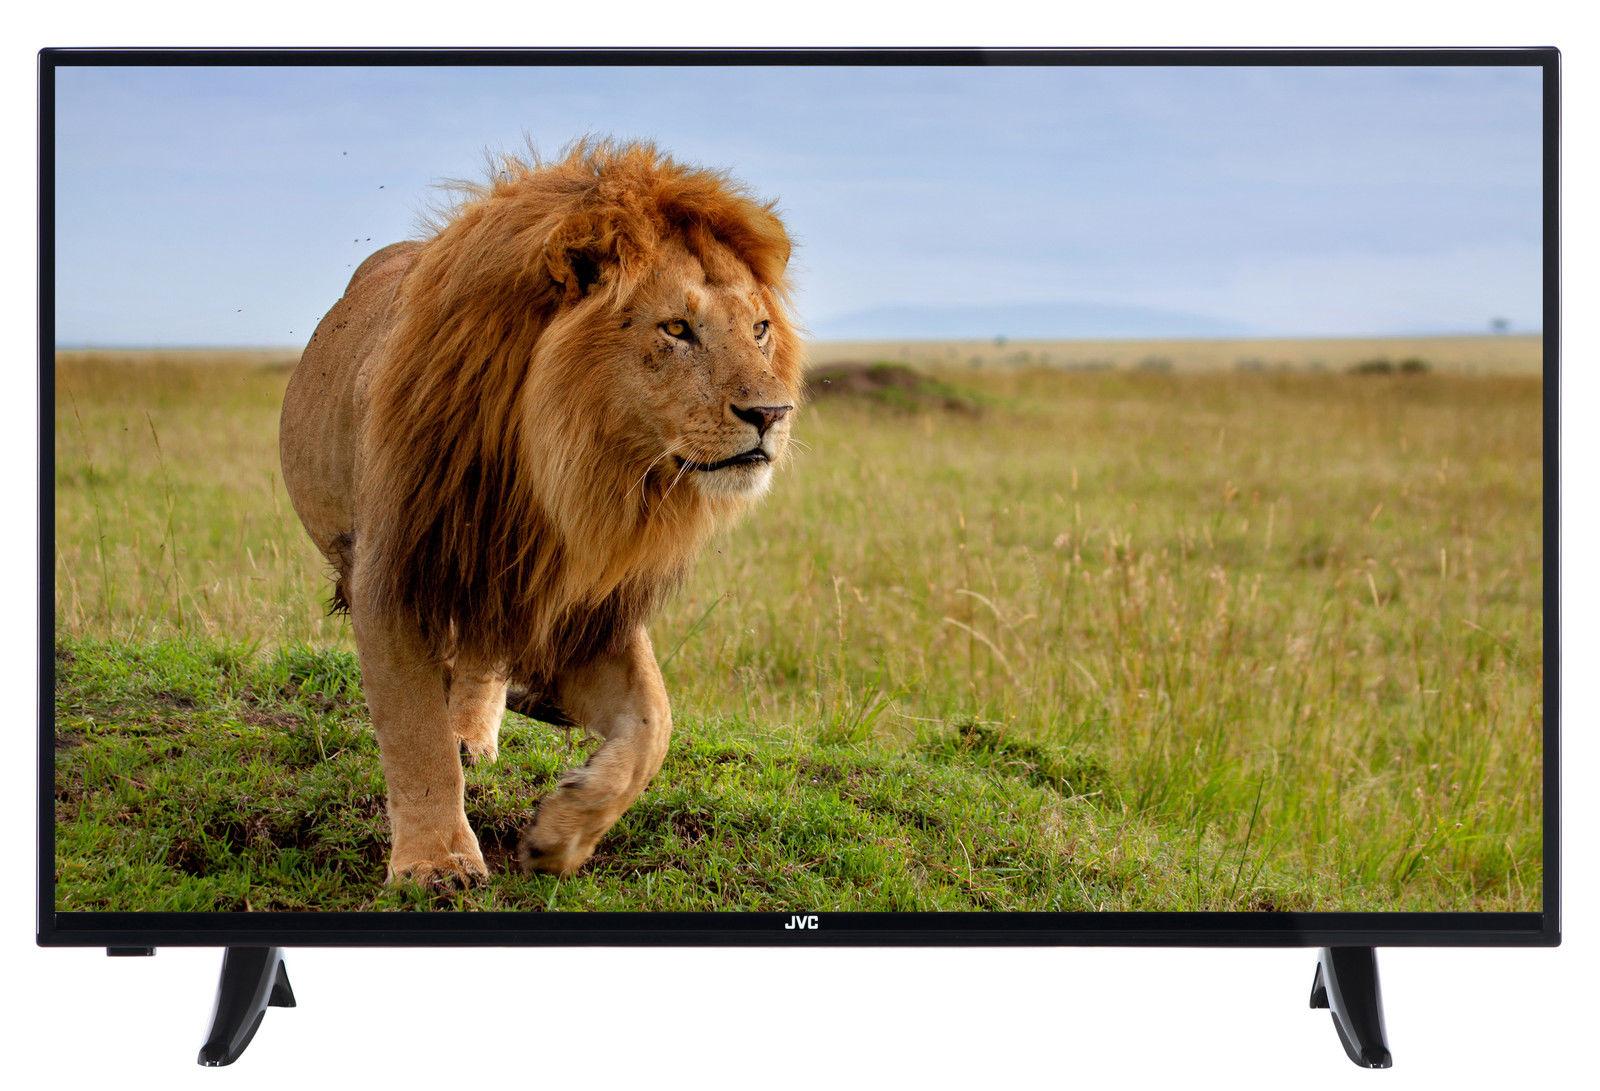 JVC LT-40VG764 LED Fernseher 40